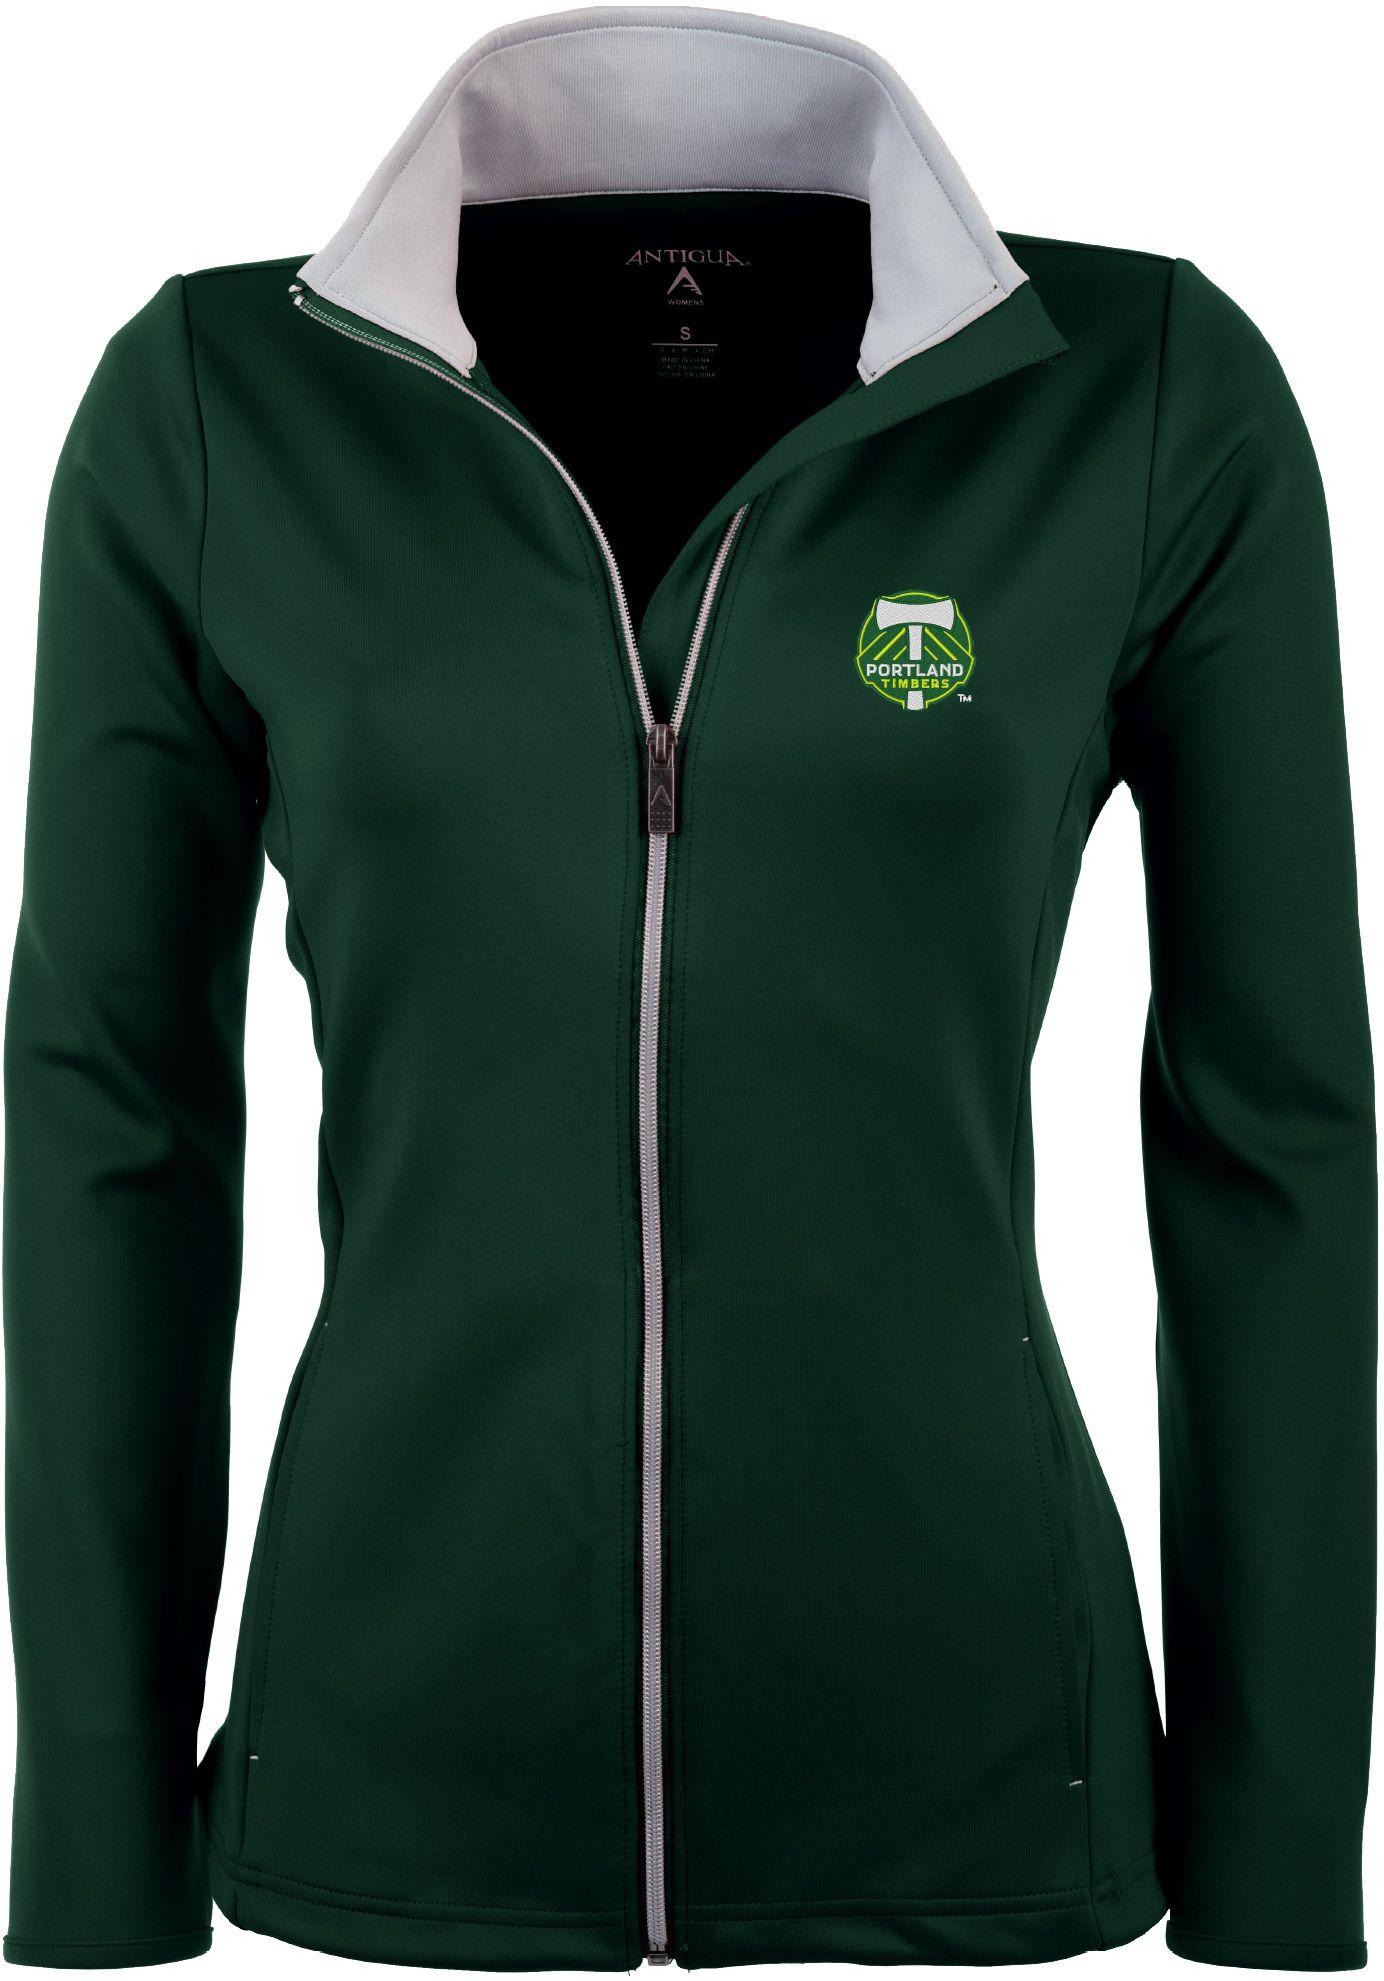 Antigua Women's Portland Timbers Hunter Green Leader Full-Zip Jacket, Size: Medium, Team thumbnail